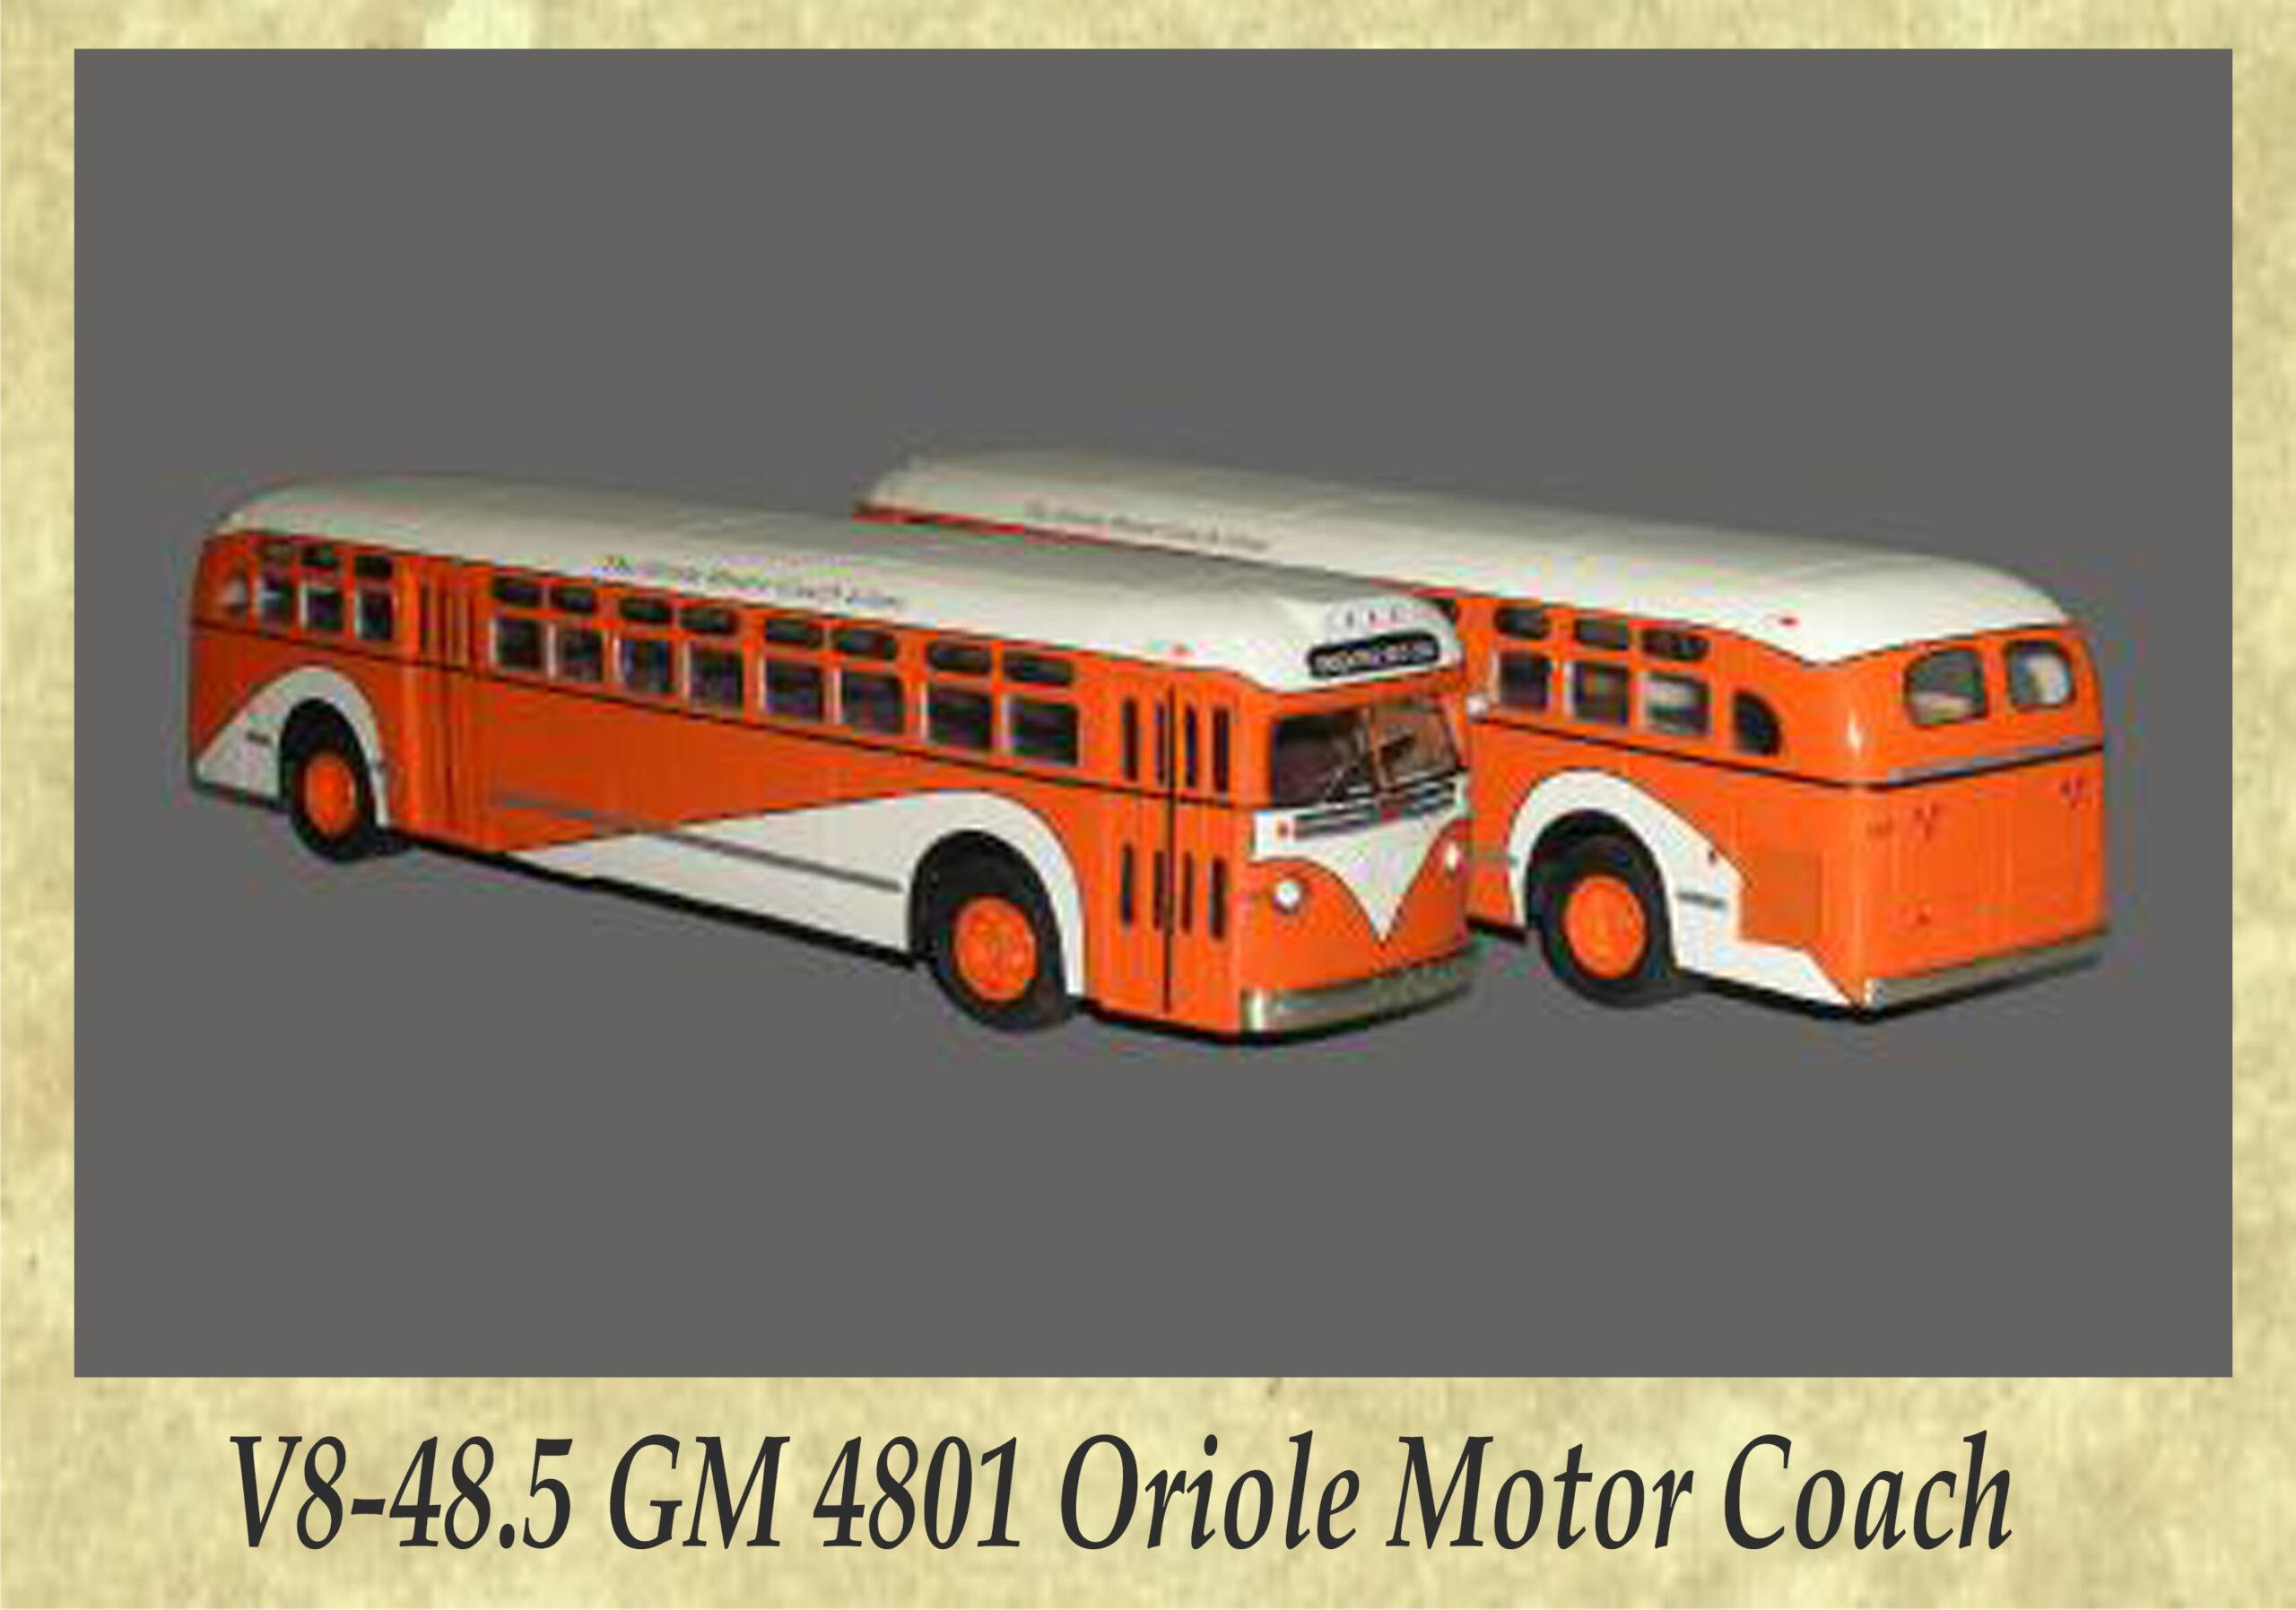 V8-48.5 GM 4801 Oriole Motor Coach